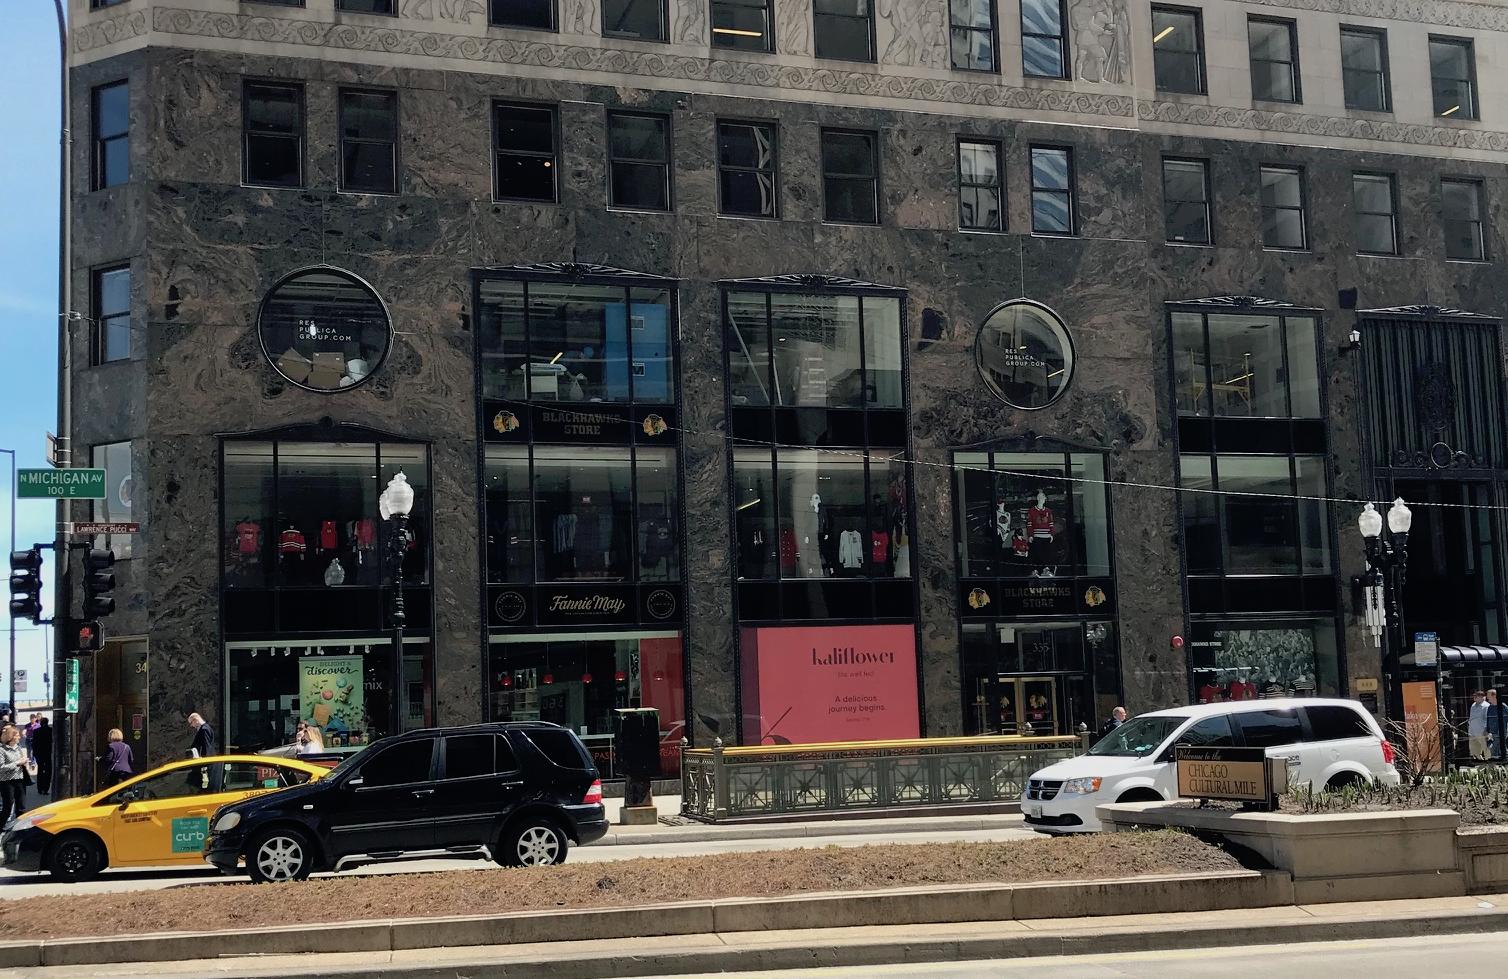 Sous Vide to Power Tiny Michigan Avenue Restaurant